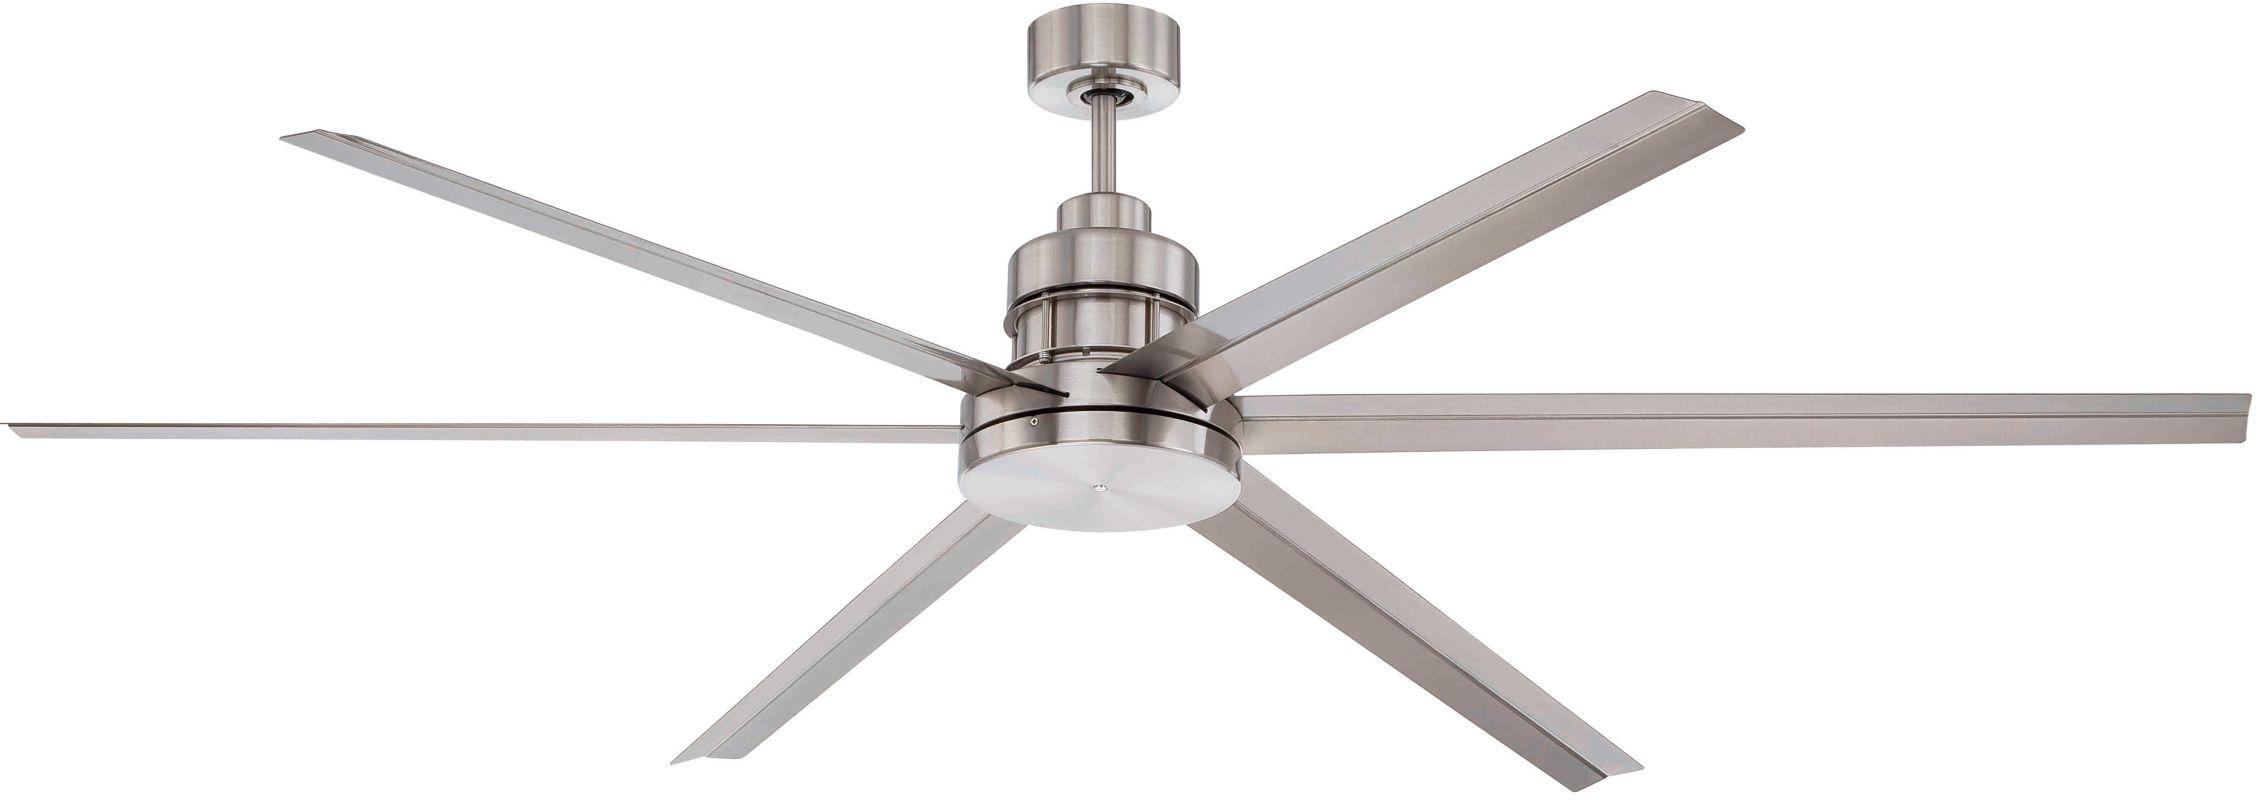 "Craftmade MND726 Mondo 72"" 6 Blade DC Motor Indoor Ceiling Fan -"